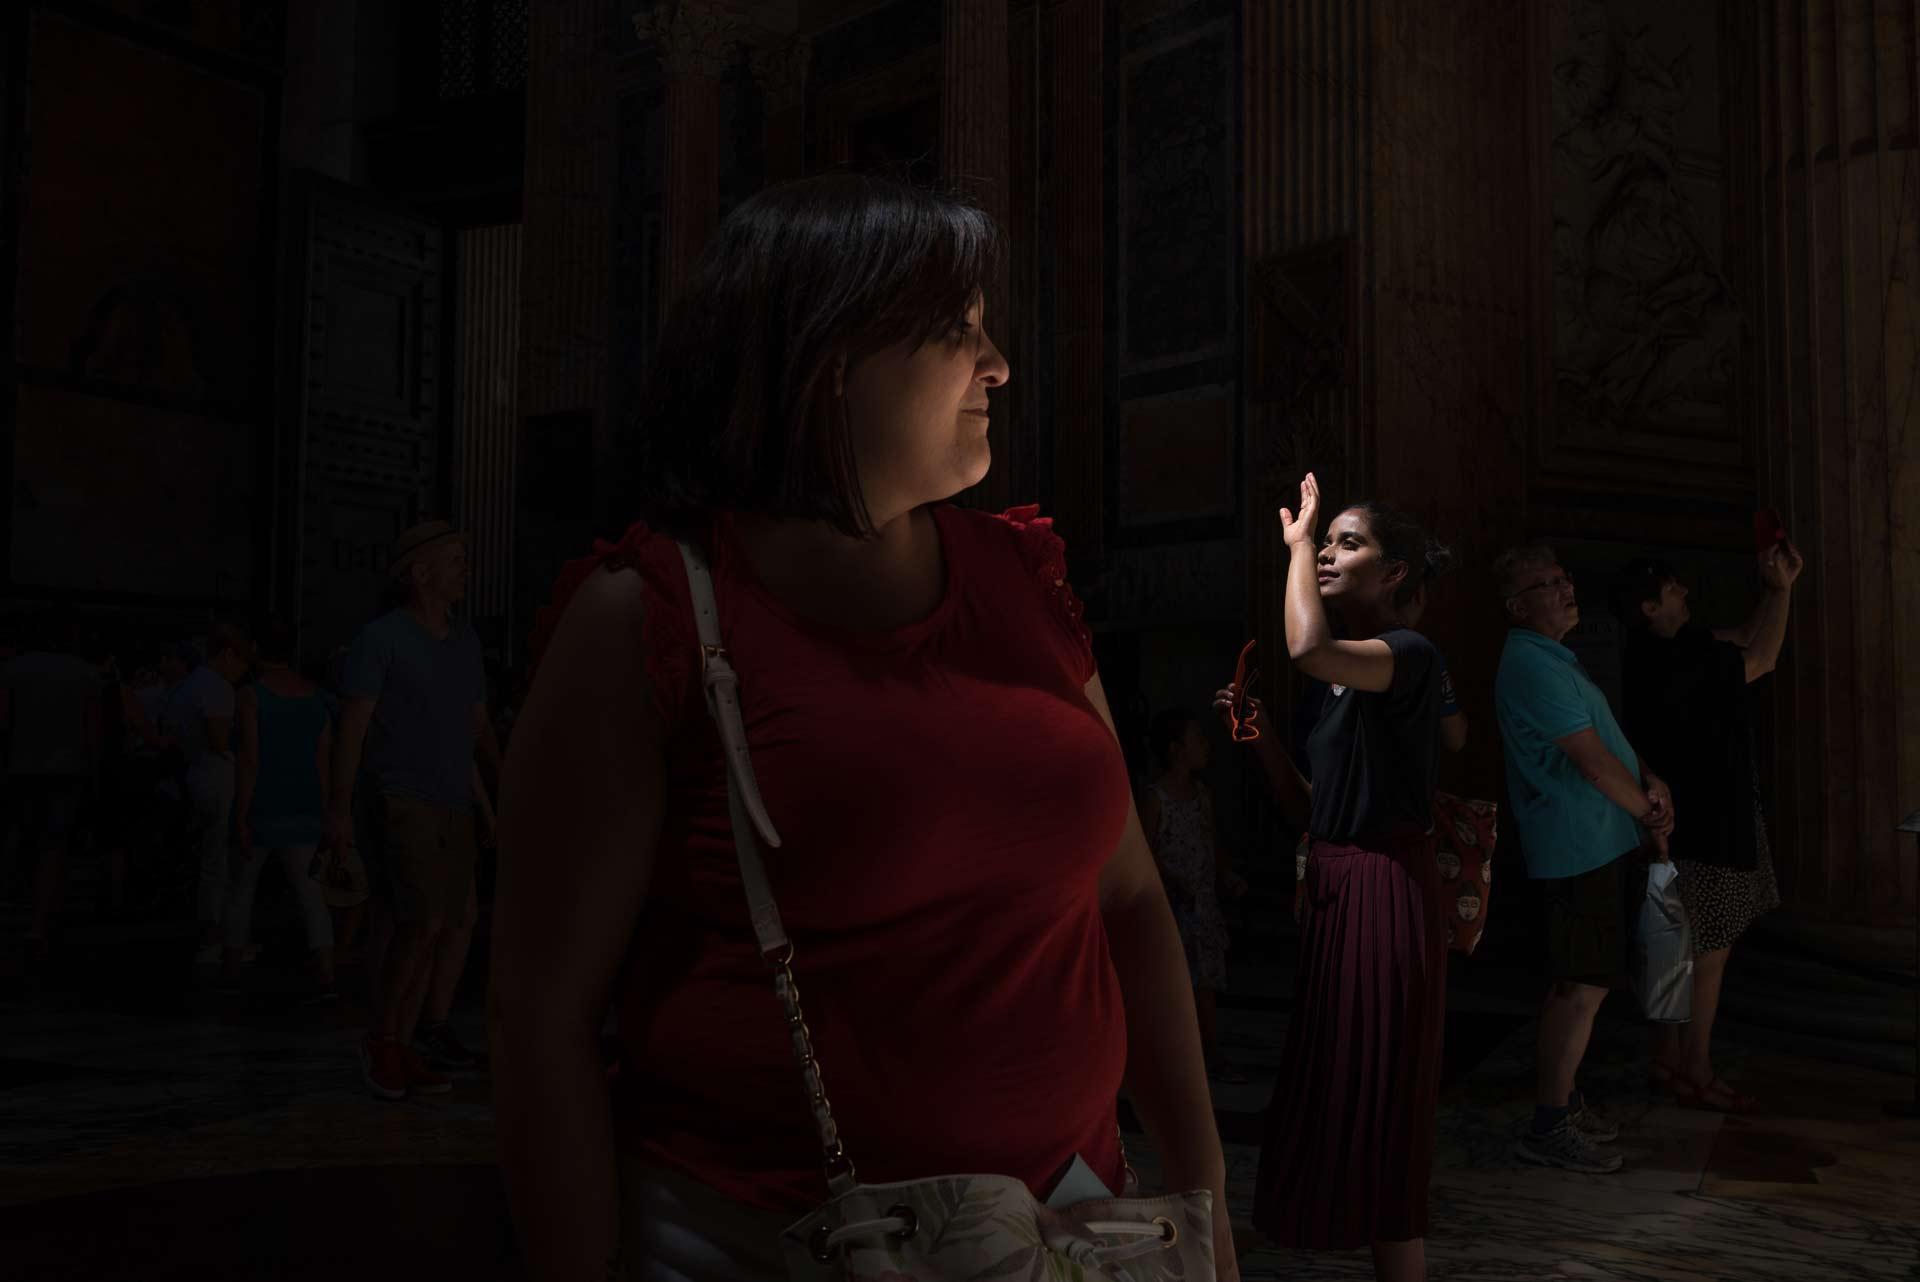 Street-Photography-Simone-Nunzi-44